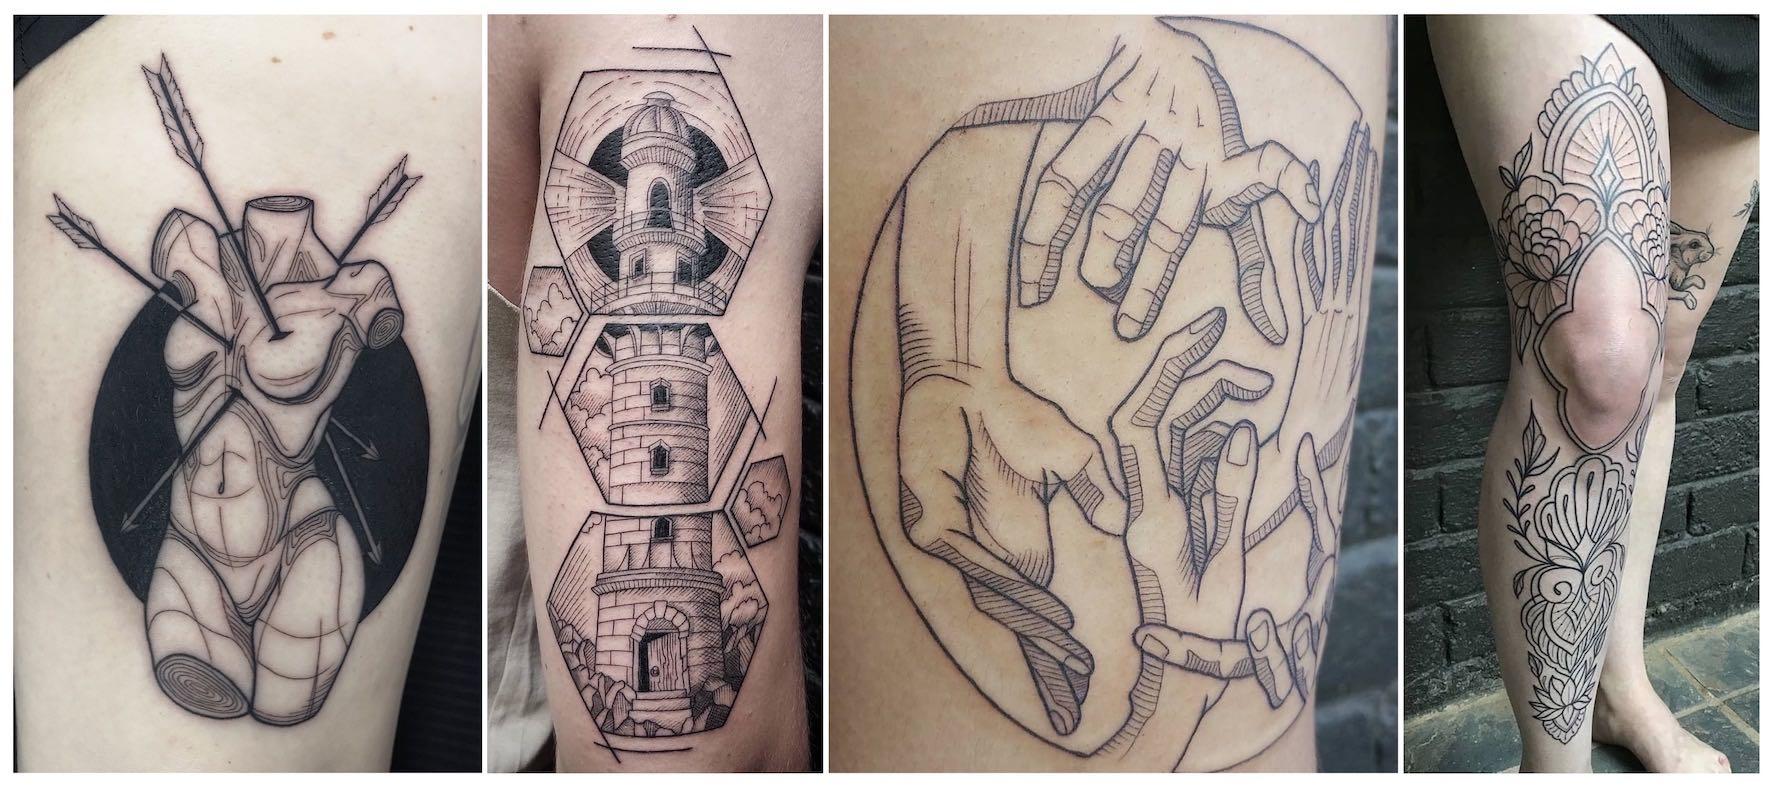 Tattoos done by Jade Alexandra